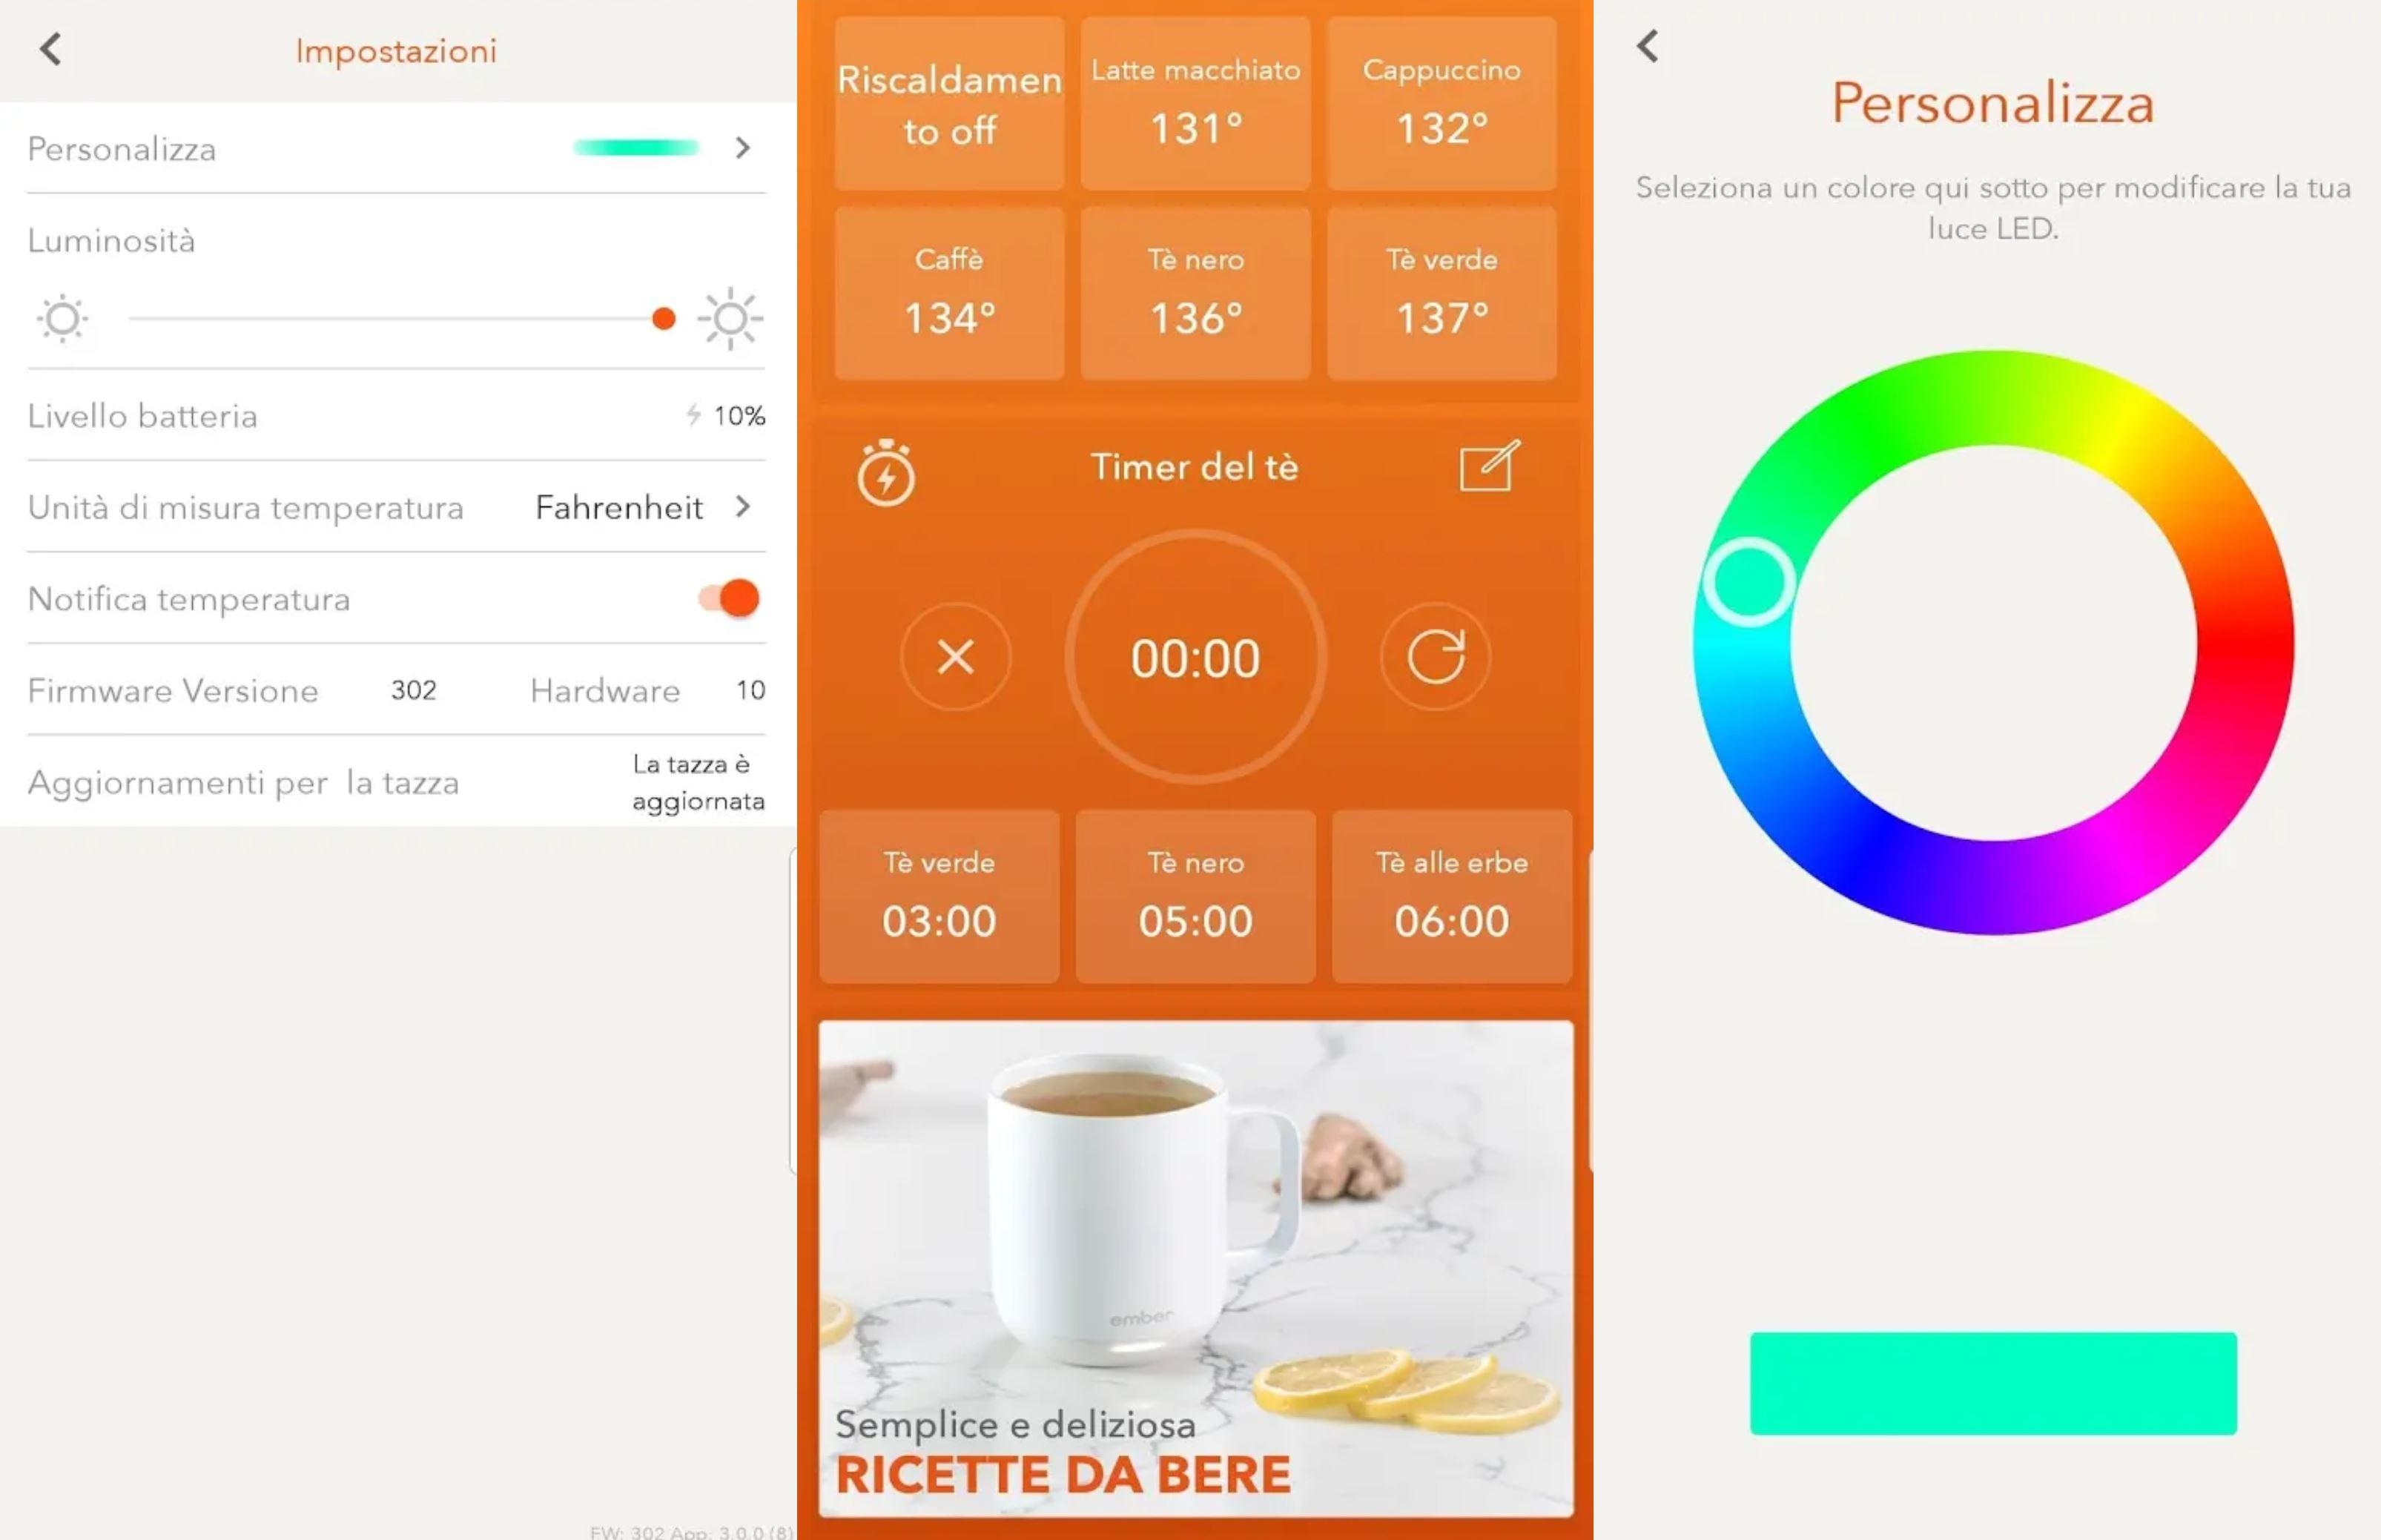 Tazza Ember - Impostazioni varie dell'app